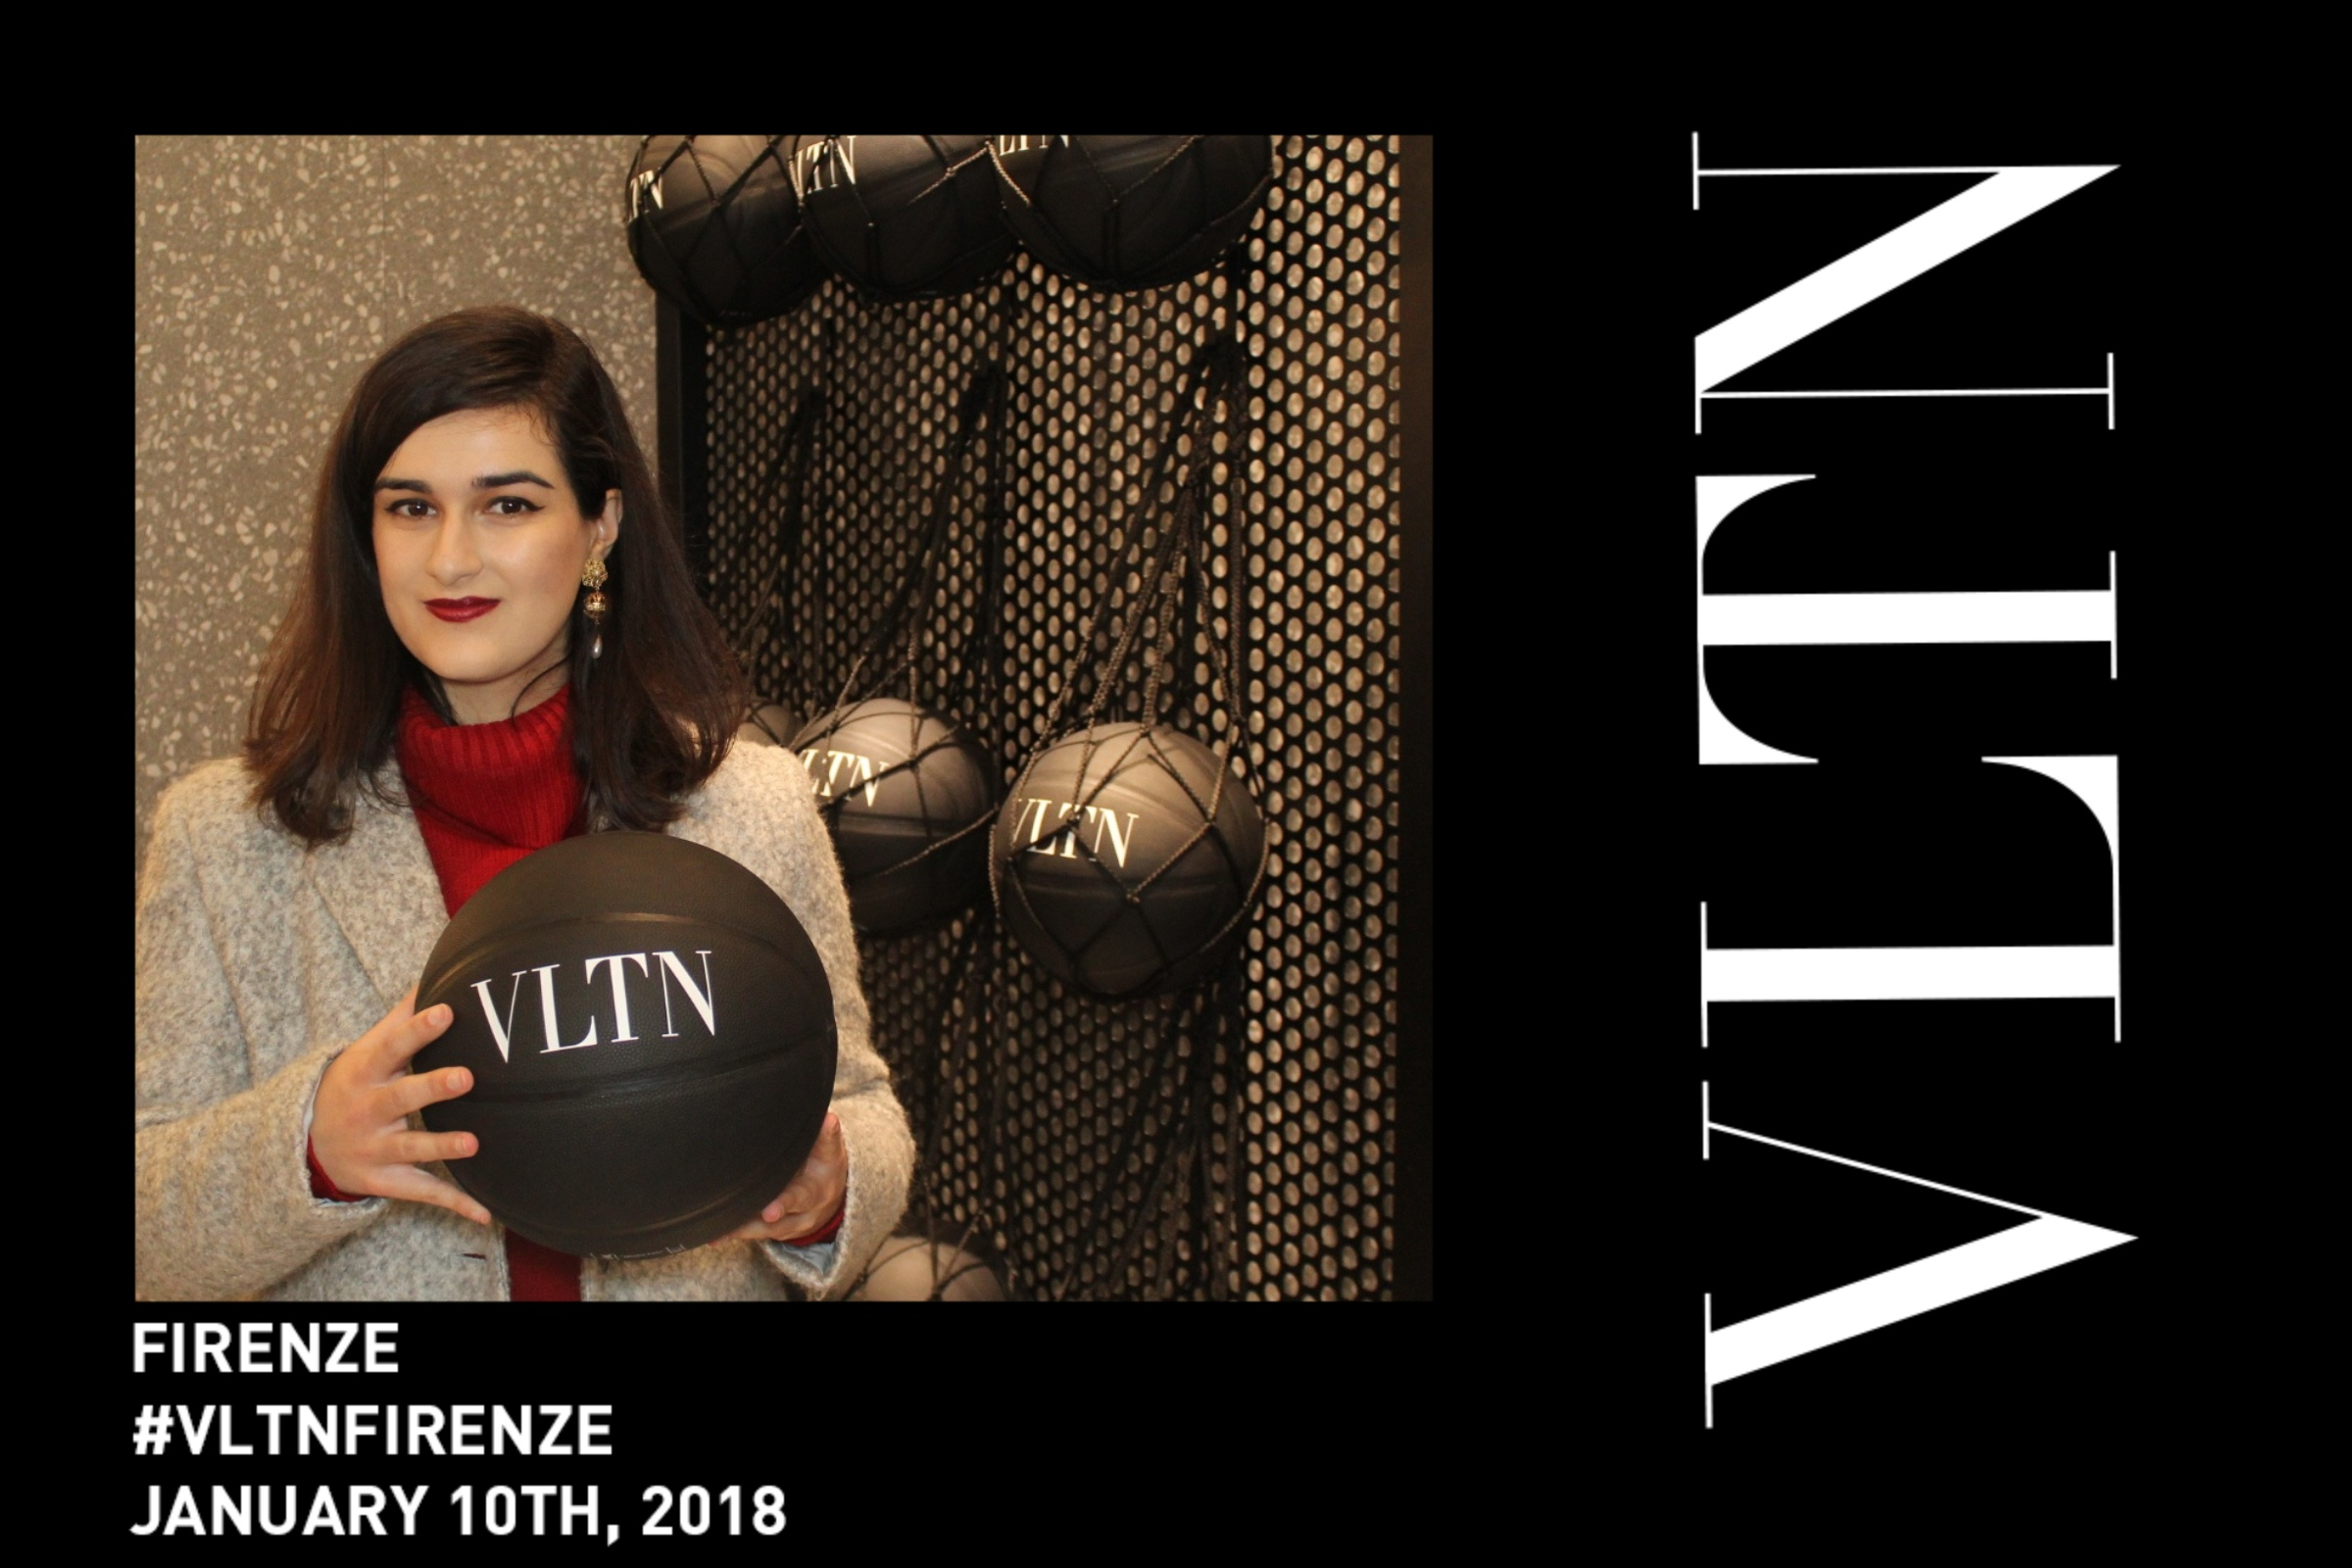 somethingfashion blogger firenze Valentino #vltn PittiUomo events cocktails Replay Replayrocksfirenze BottegaQuatro